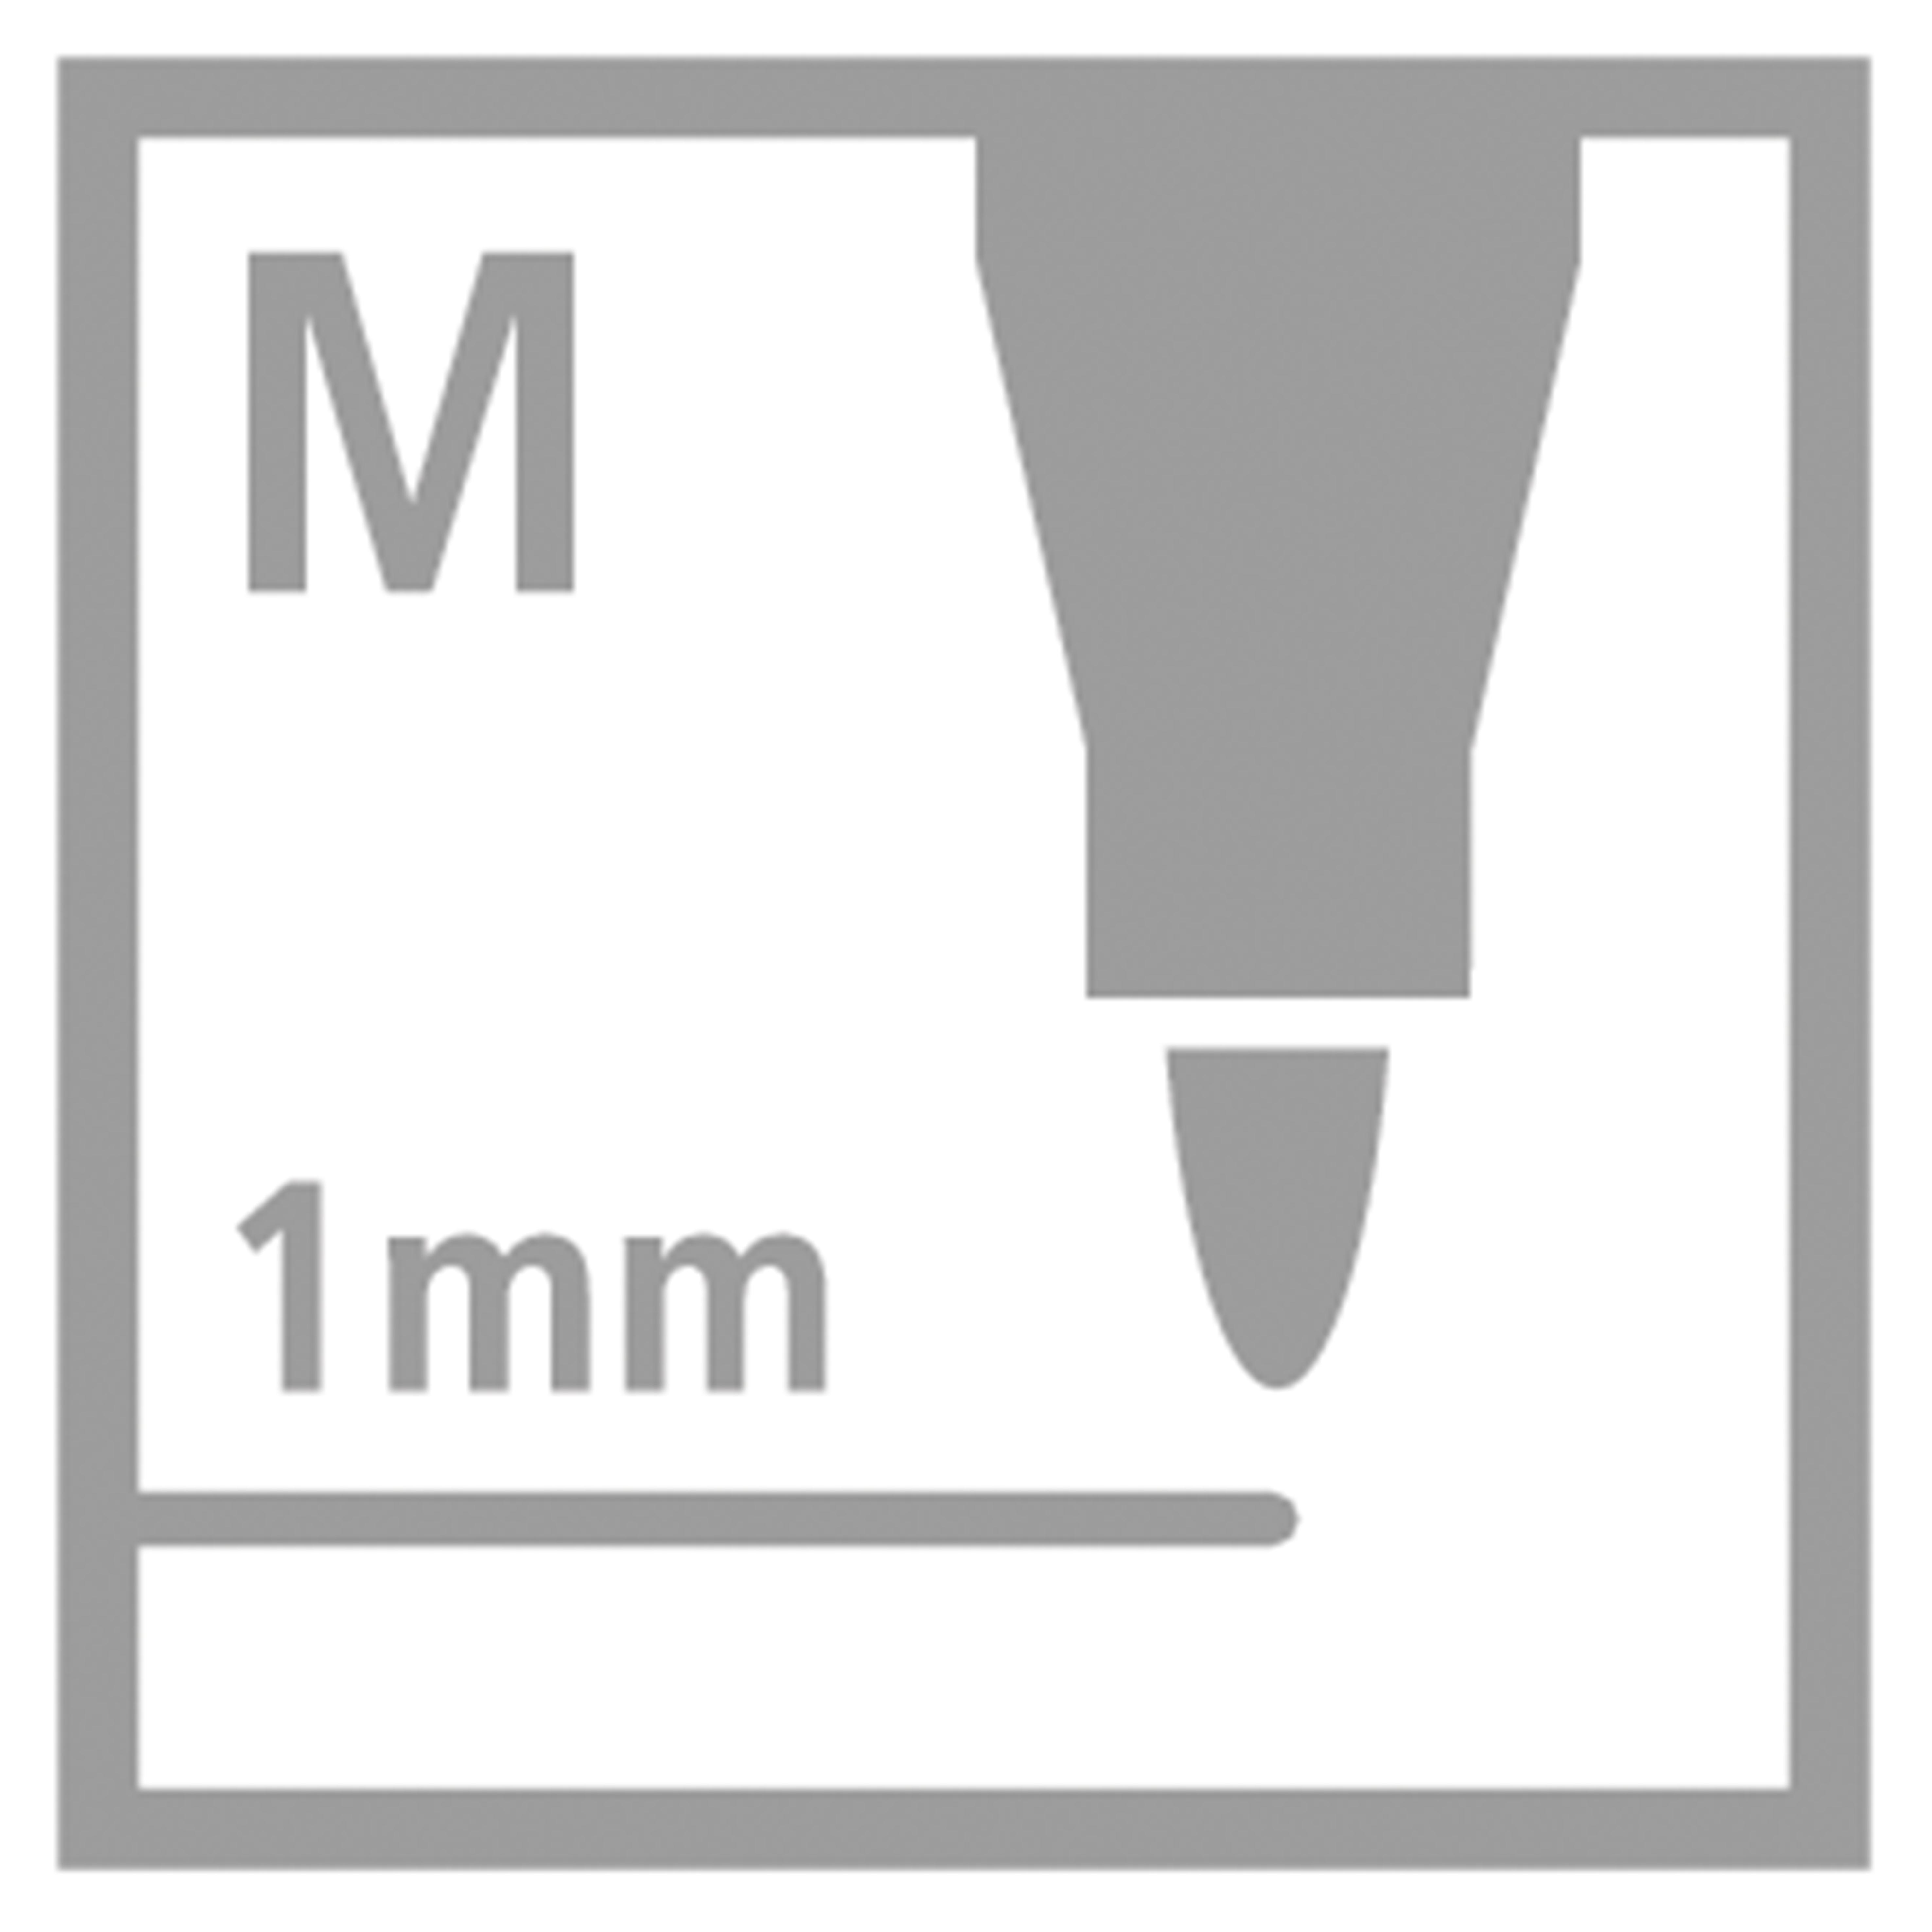 Stabilo cappi wallet of felt tip pen amazon